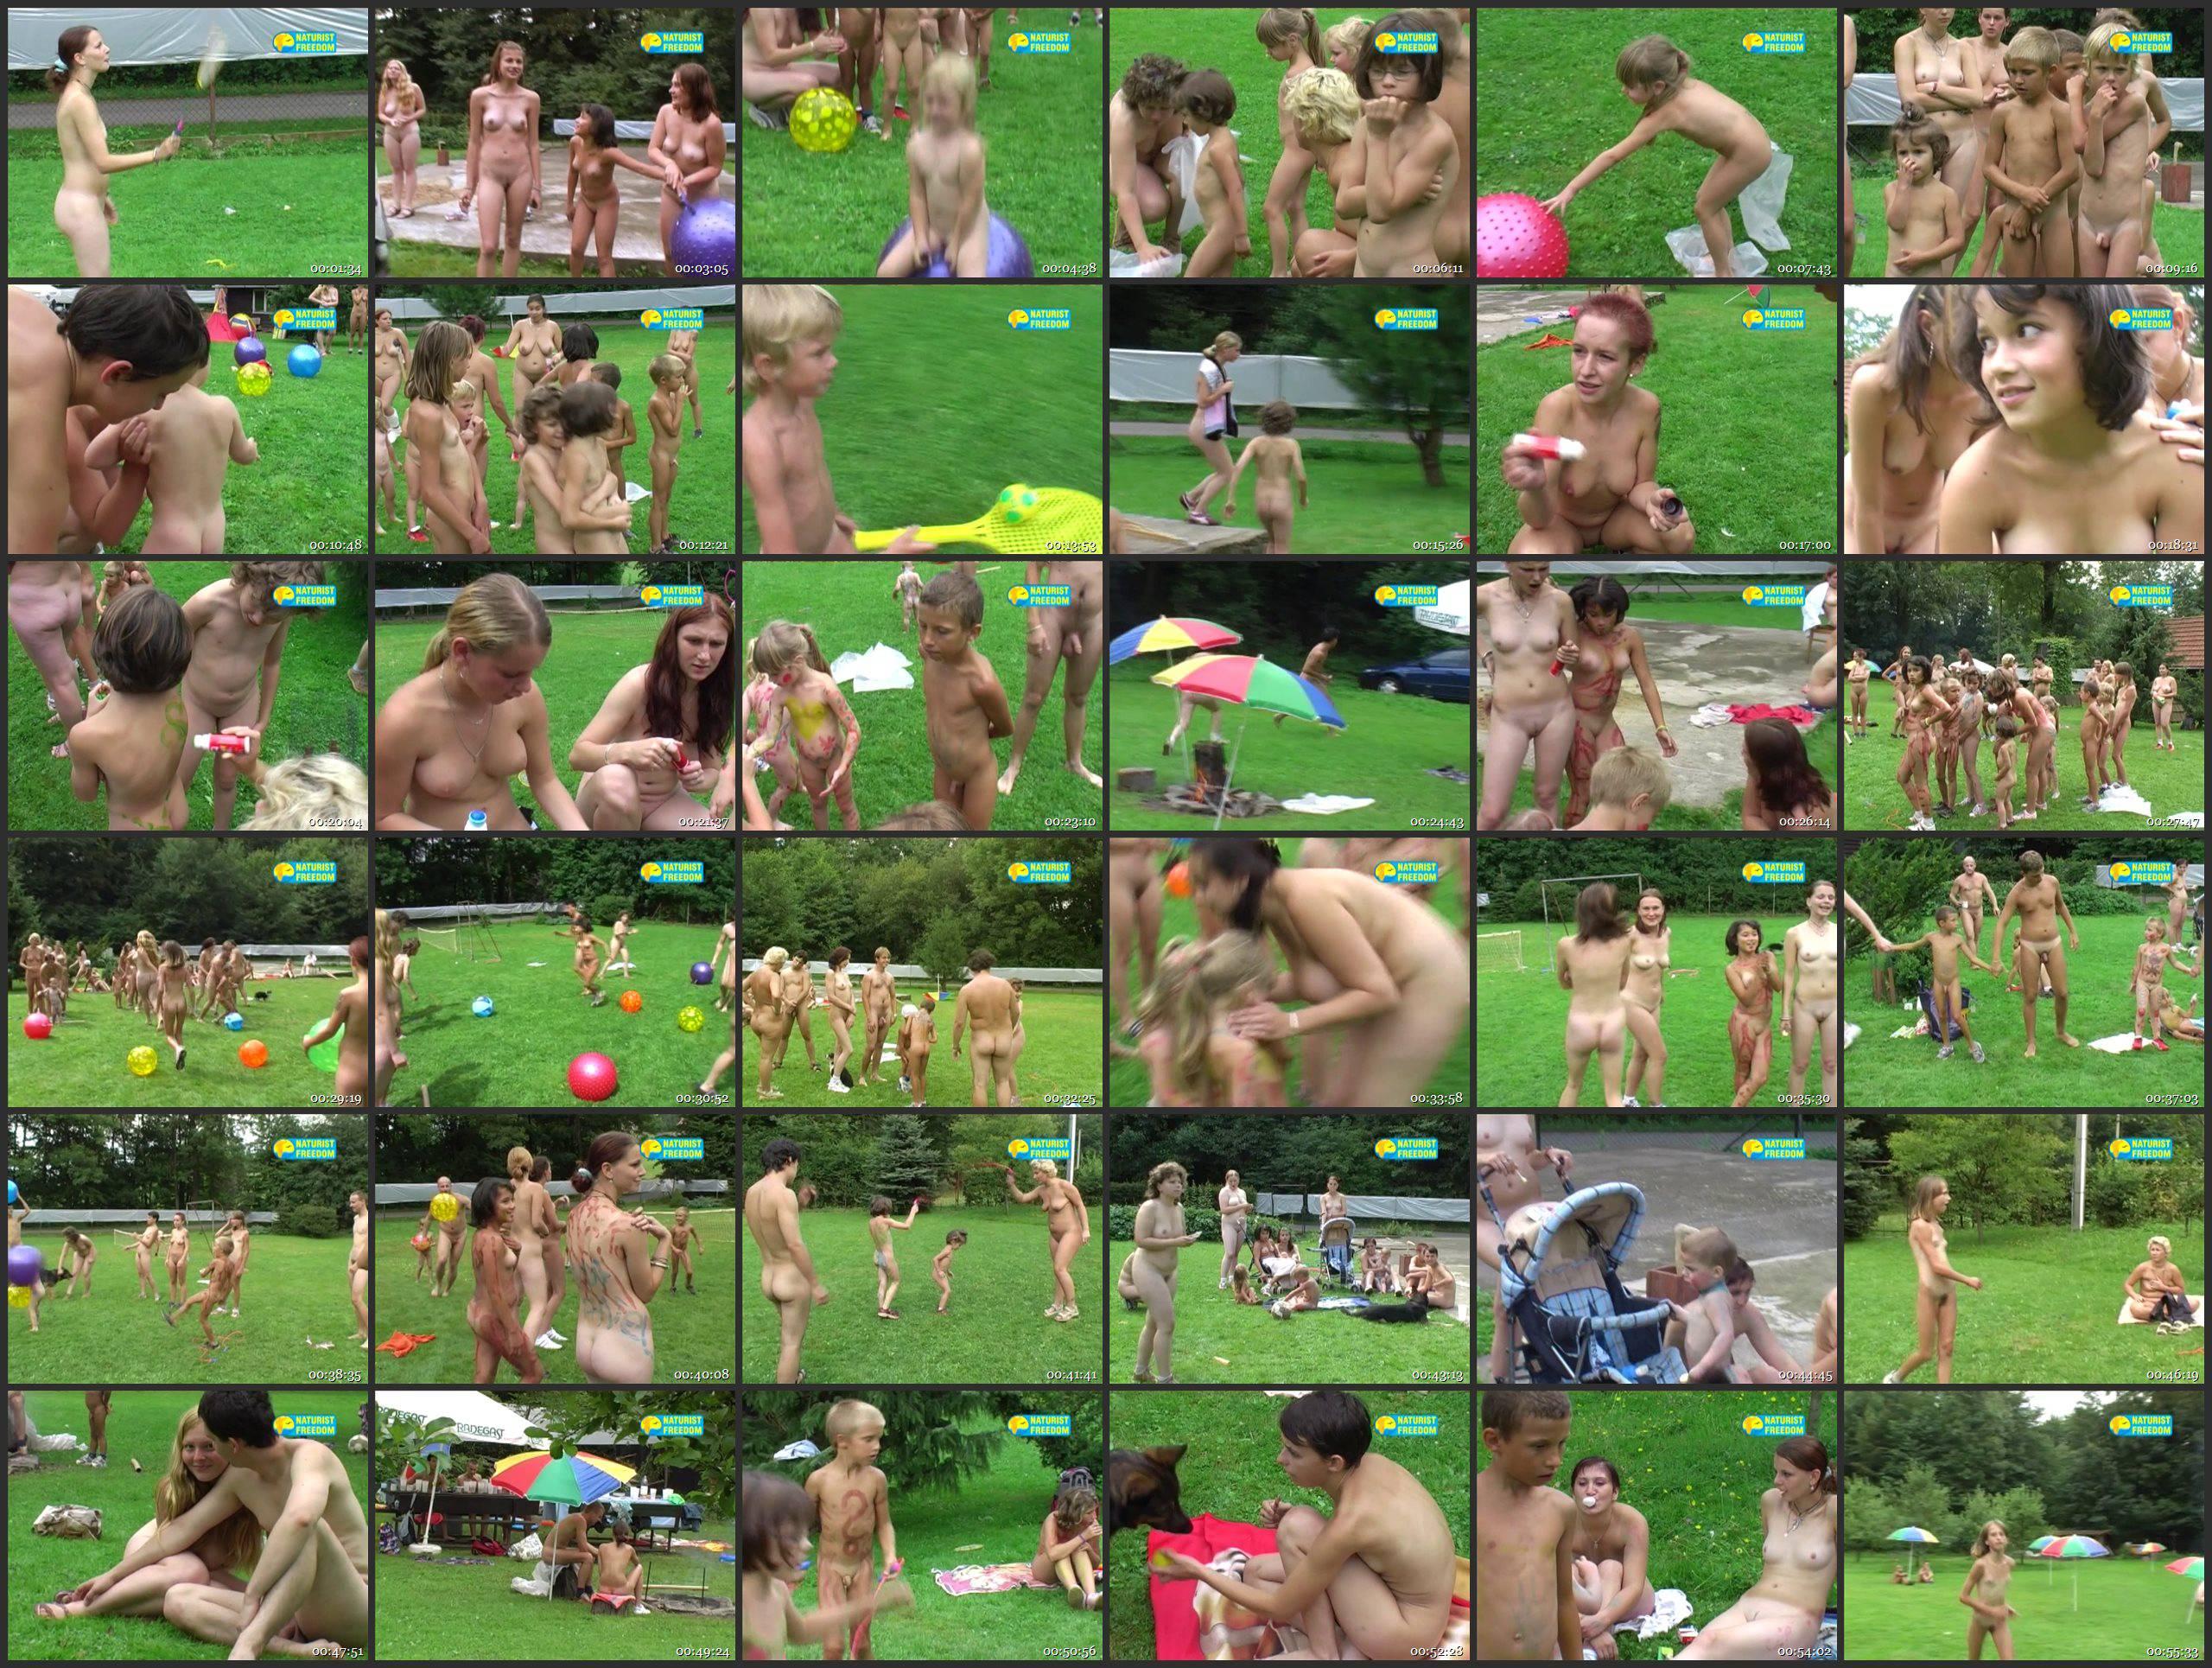 Naturist Freedom Videos Children's Afternoon - Thumbnails